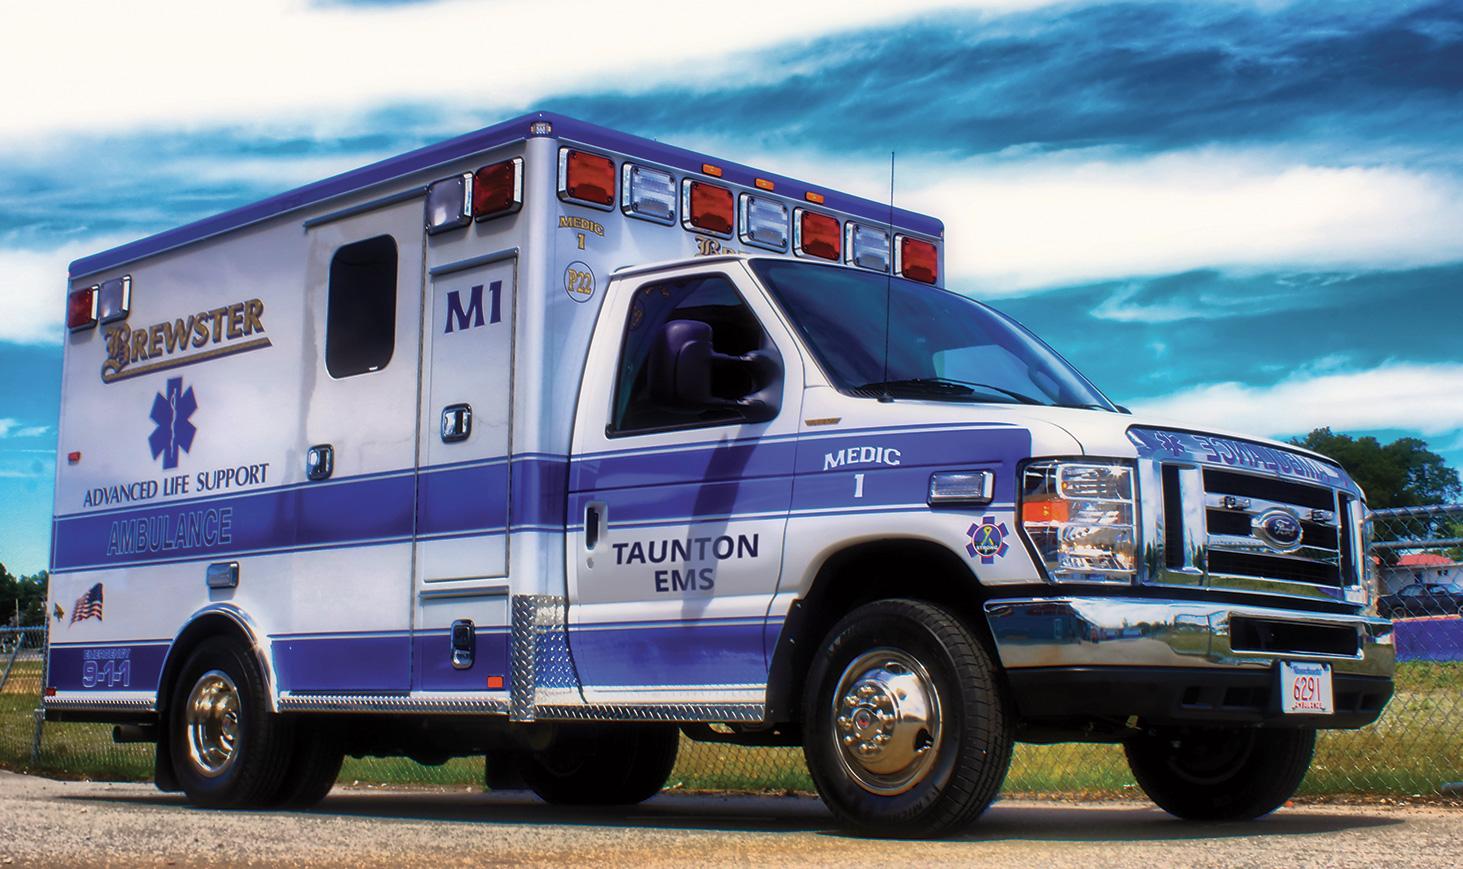 Taunton ALS ambulance